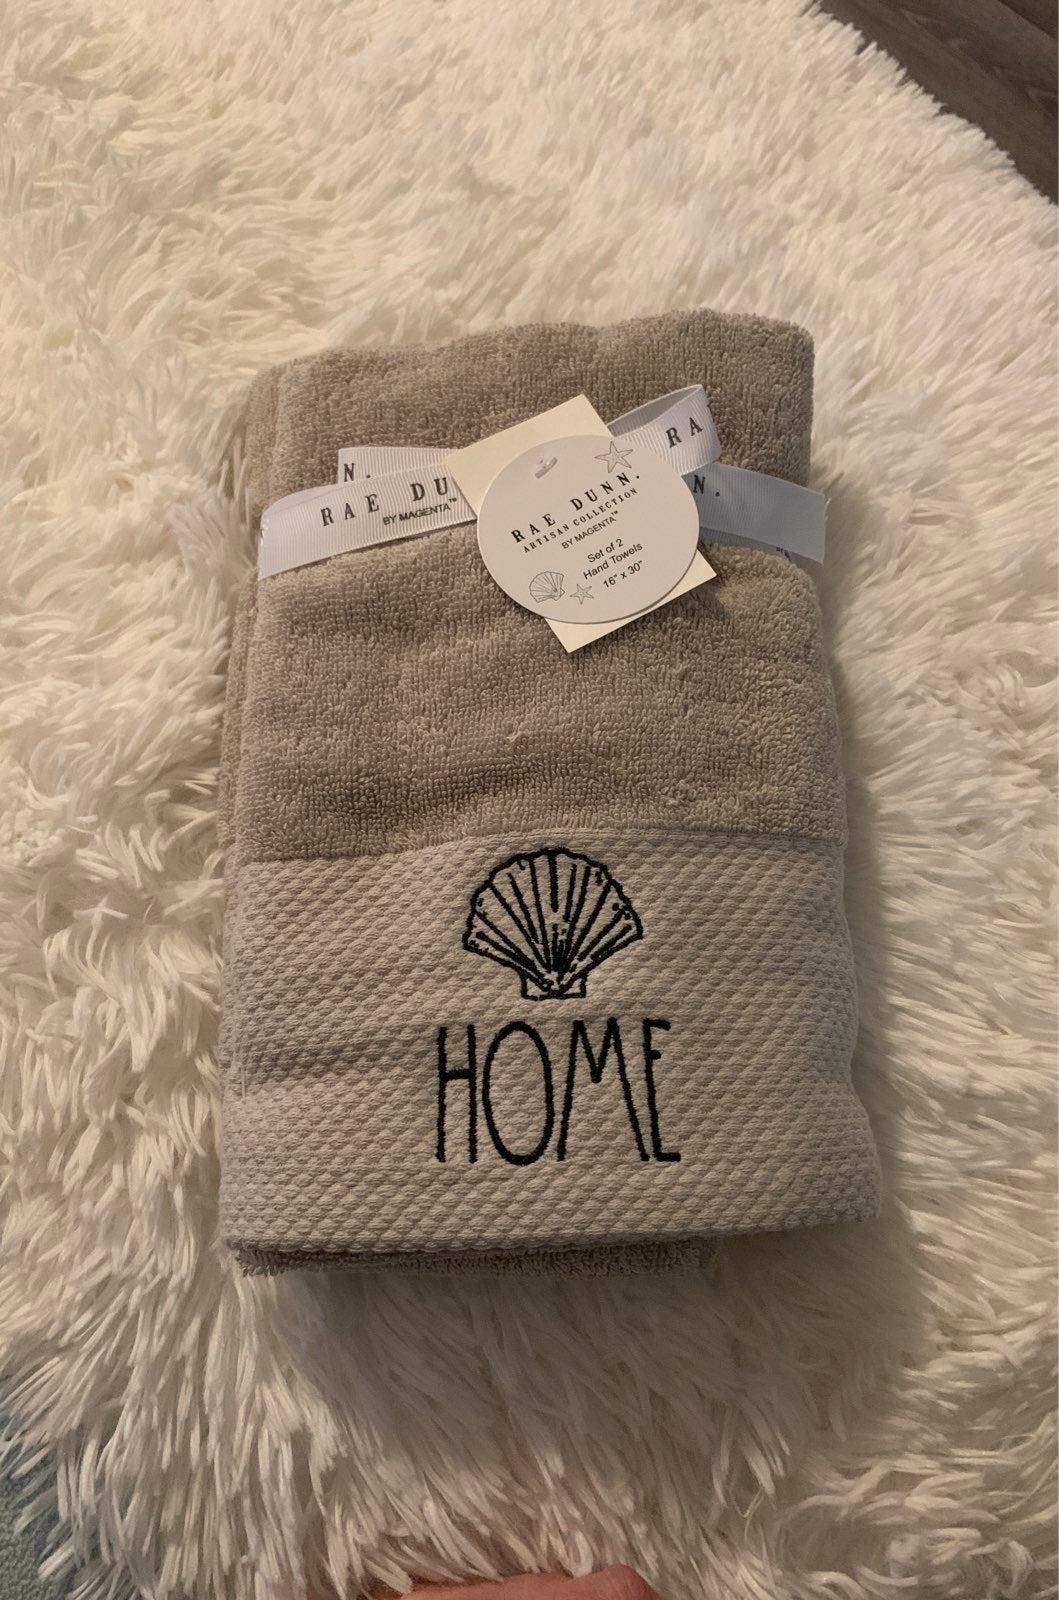 Nwt Rae Dunn grey seashell hand towel